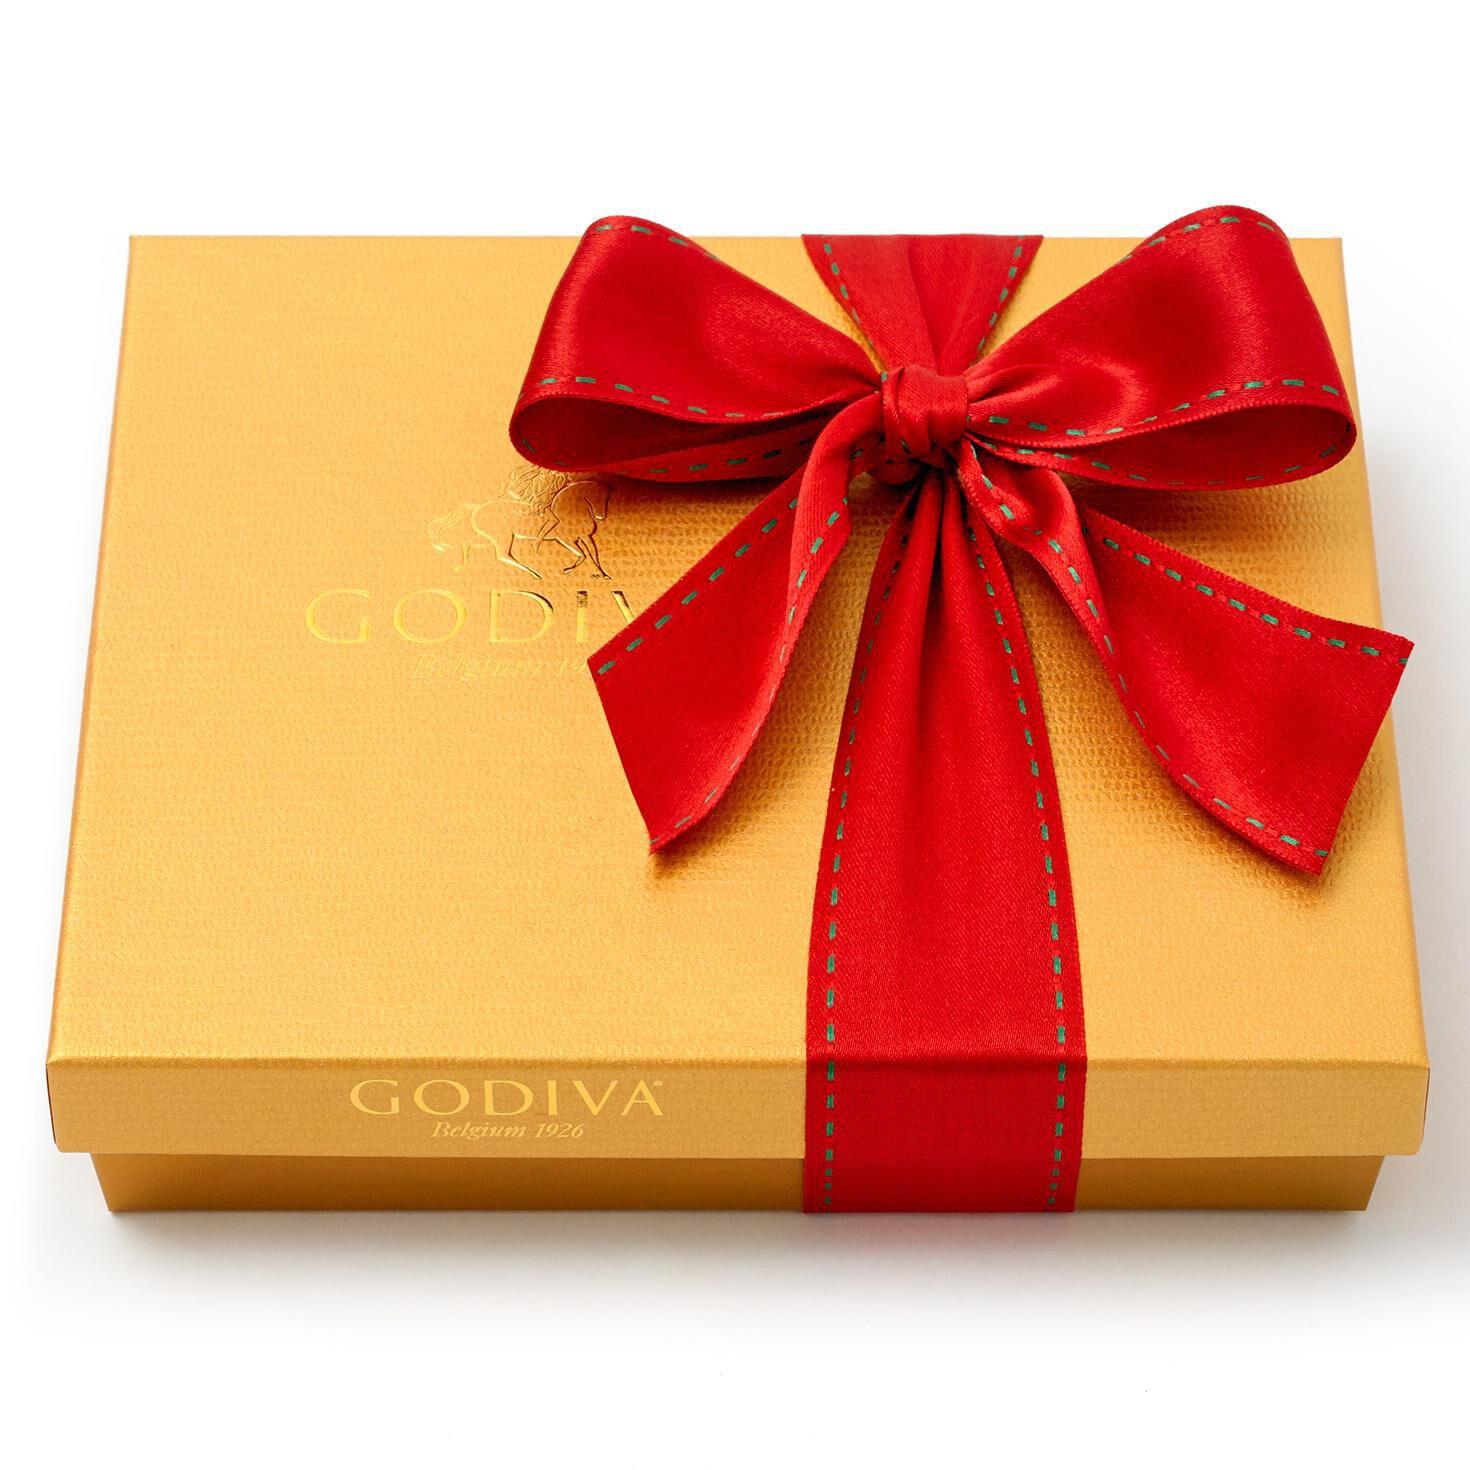 Godiva Chocolatier Assorted Chocolates Gold Holiday Gift Box 19